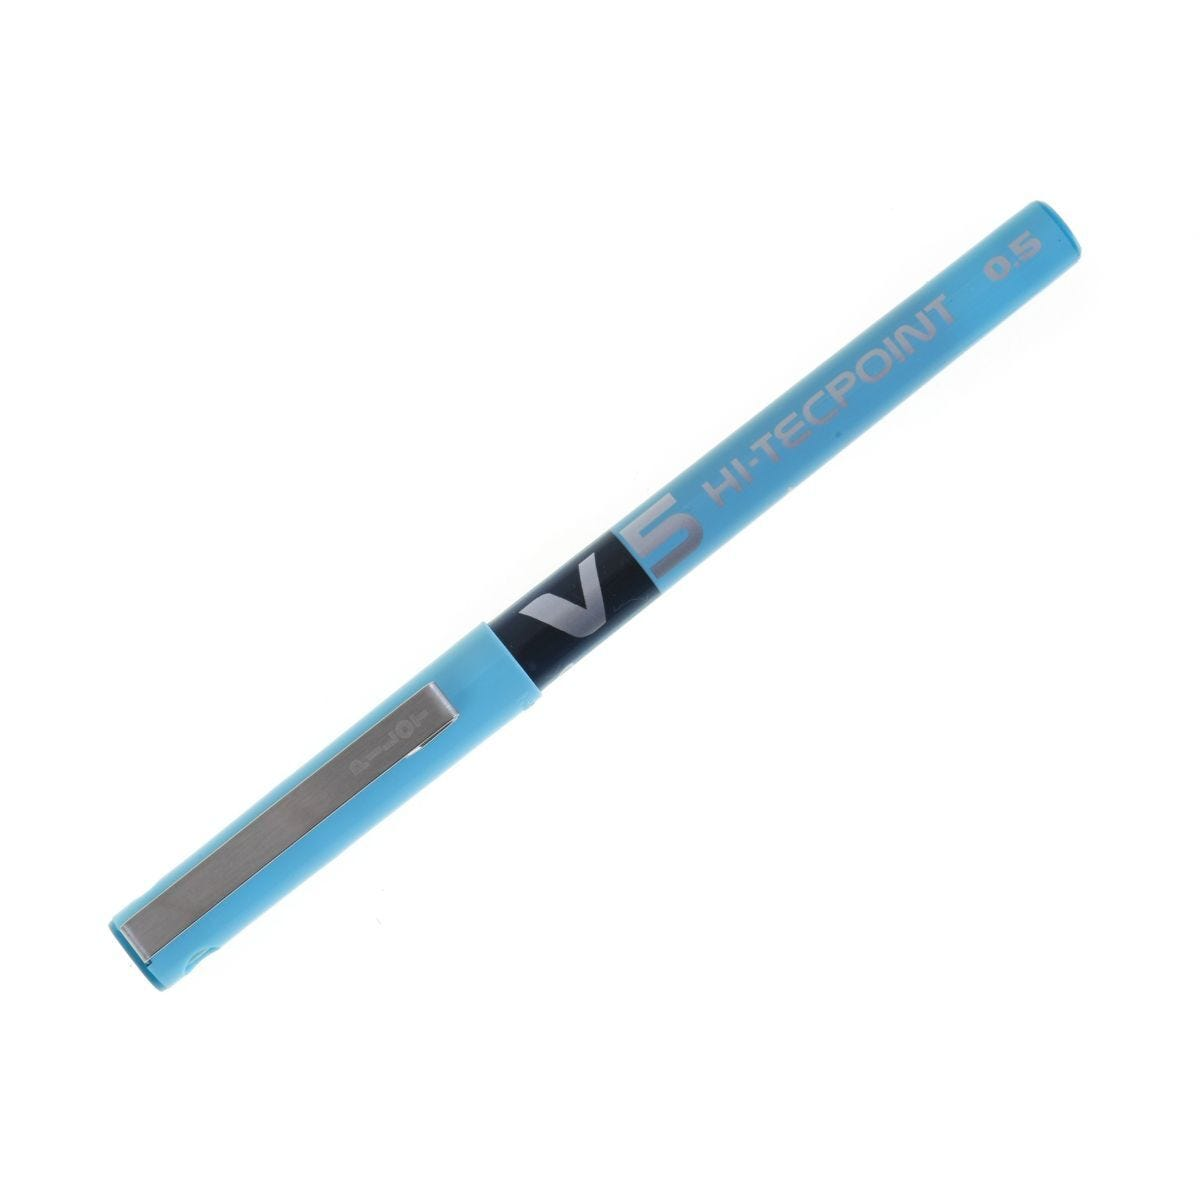 Pilot Hi Tec V5 Rollerball Pen Extra Fine Turquoise